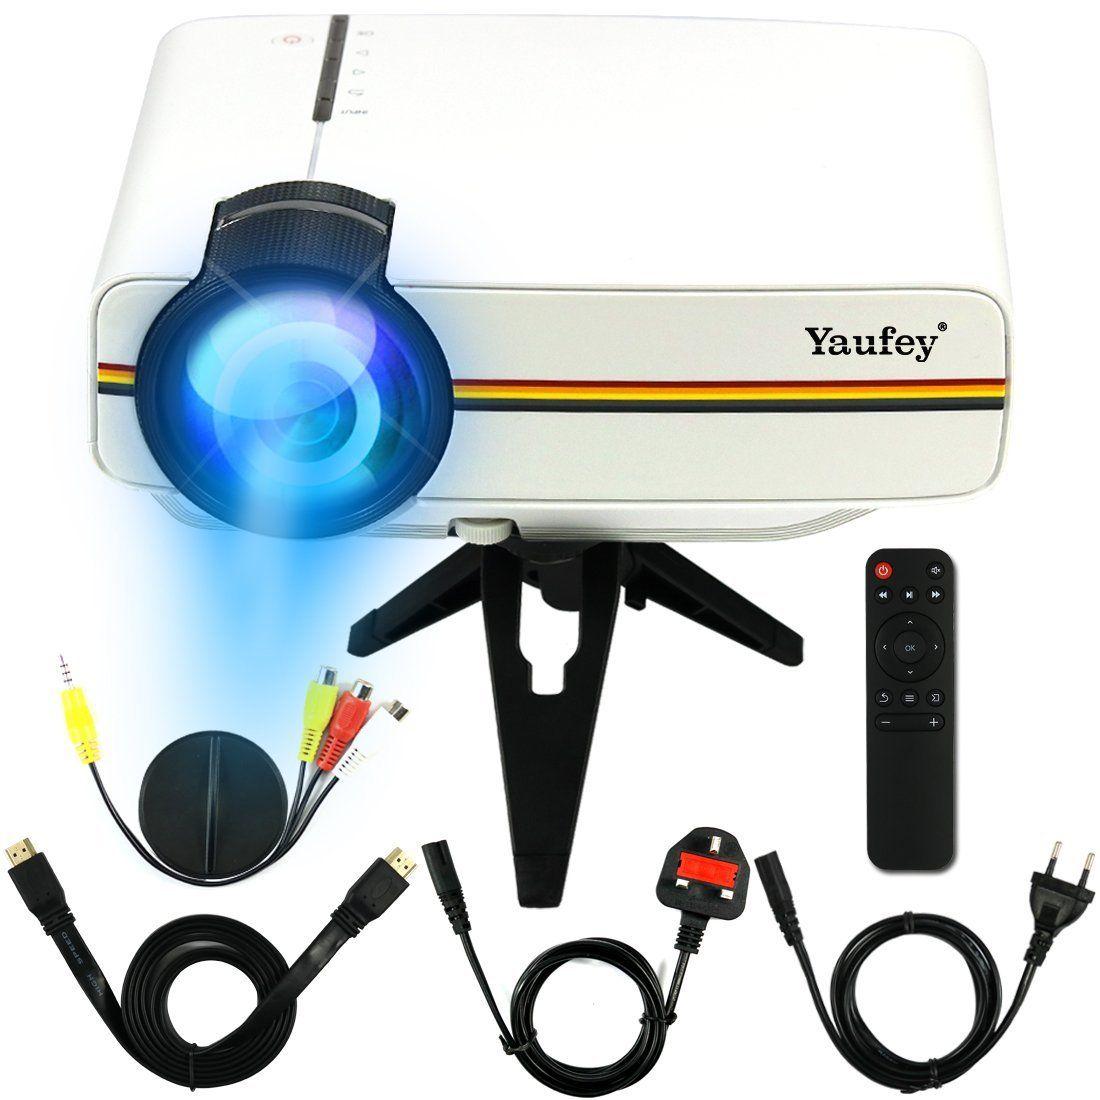 Yaufey® 1200 lumens Mini LED Projector Multimedia Home